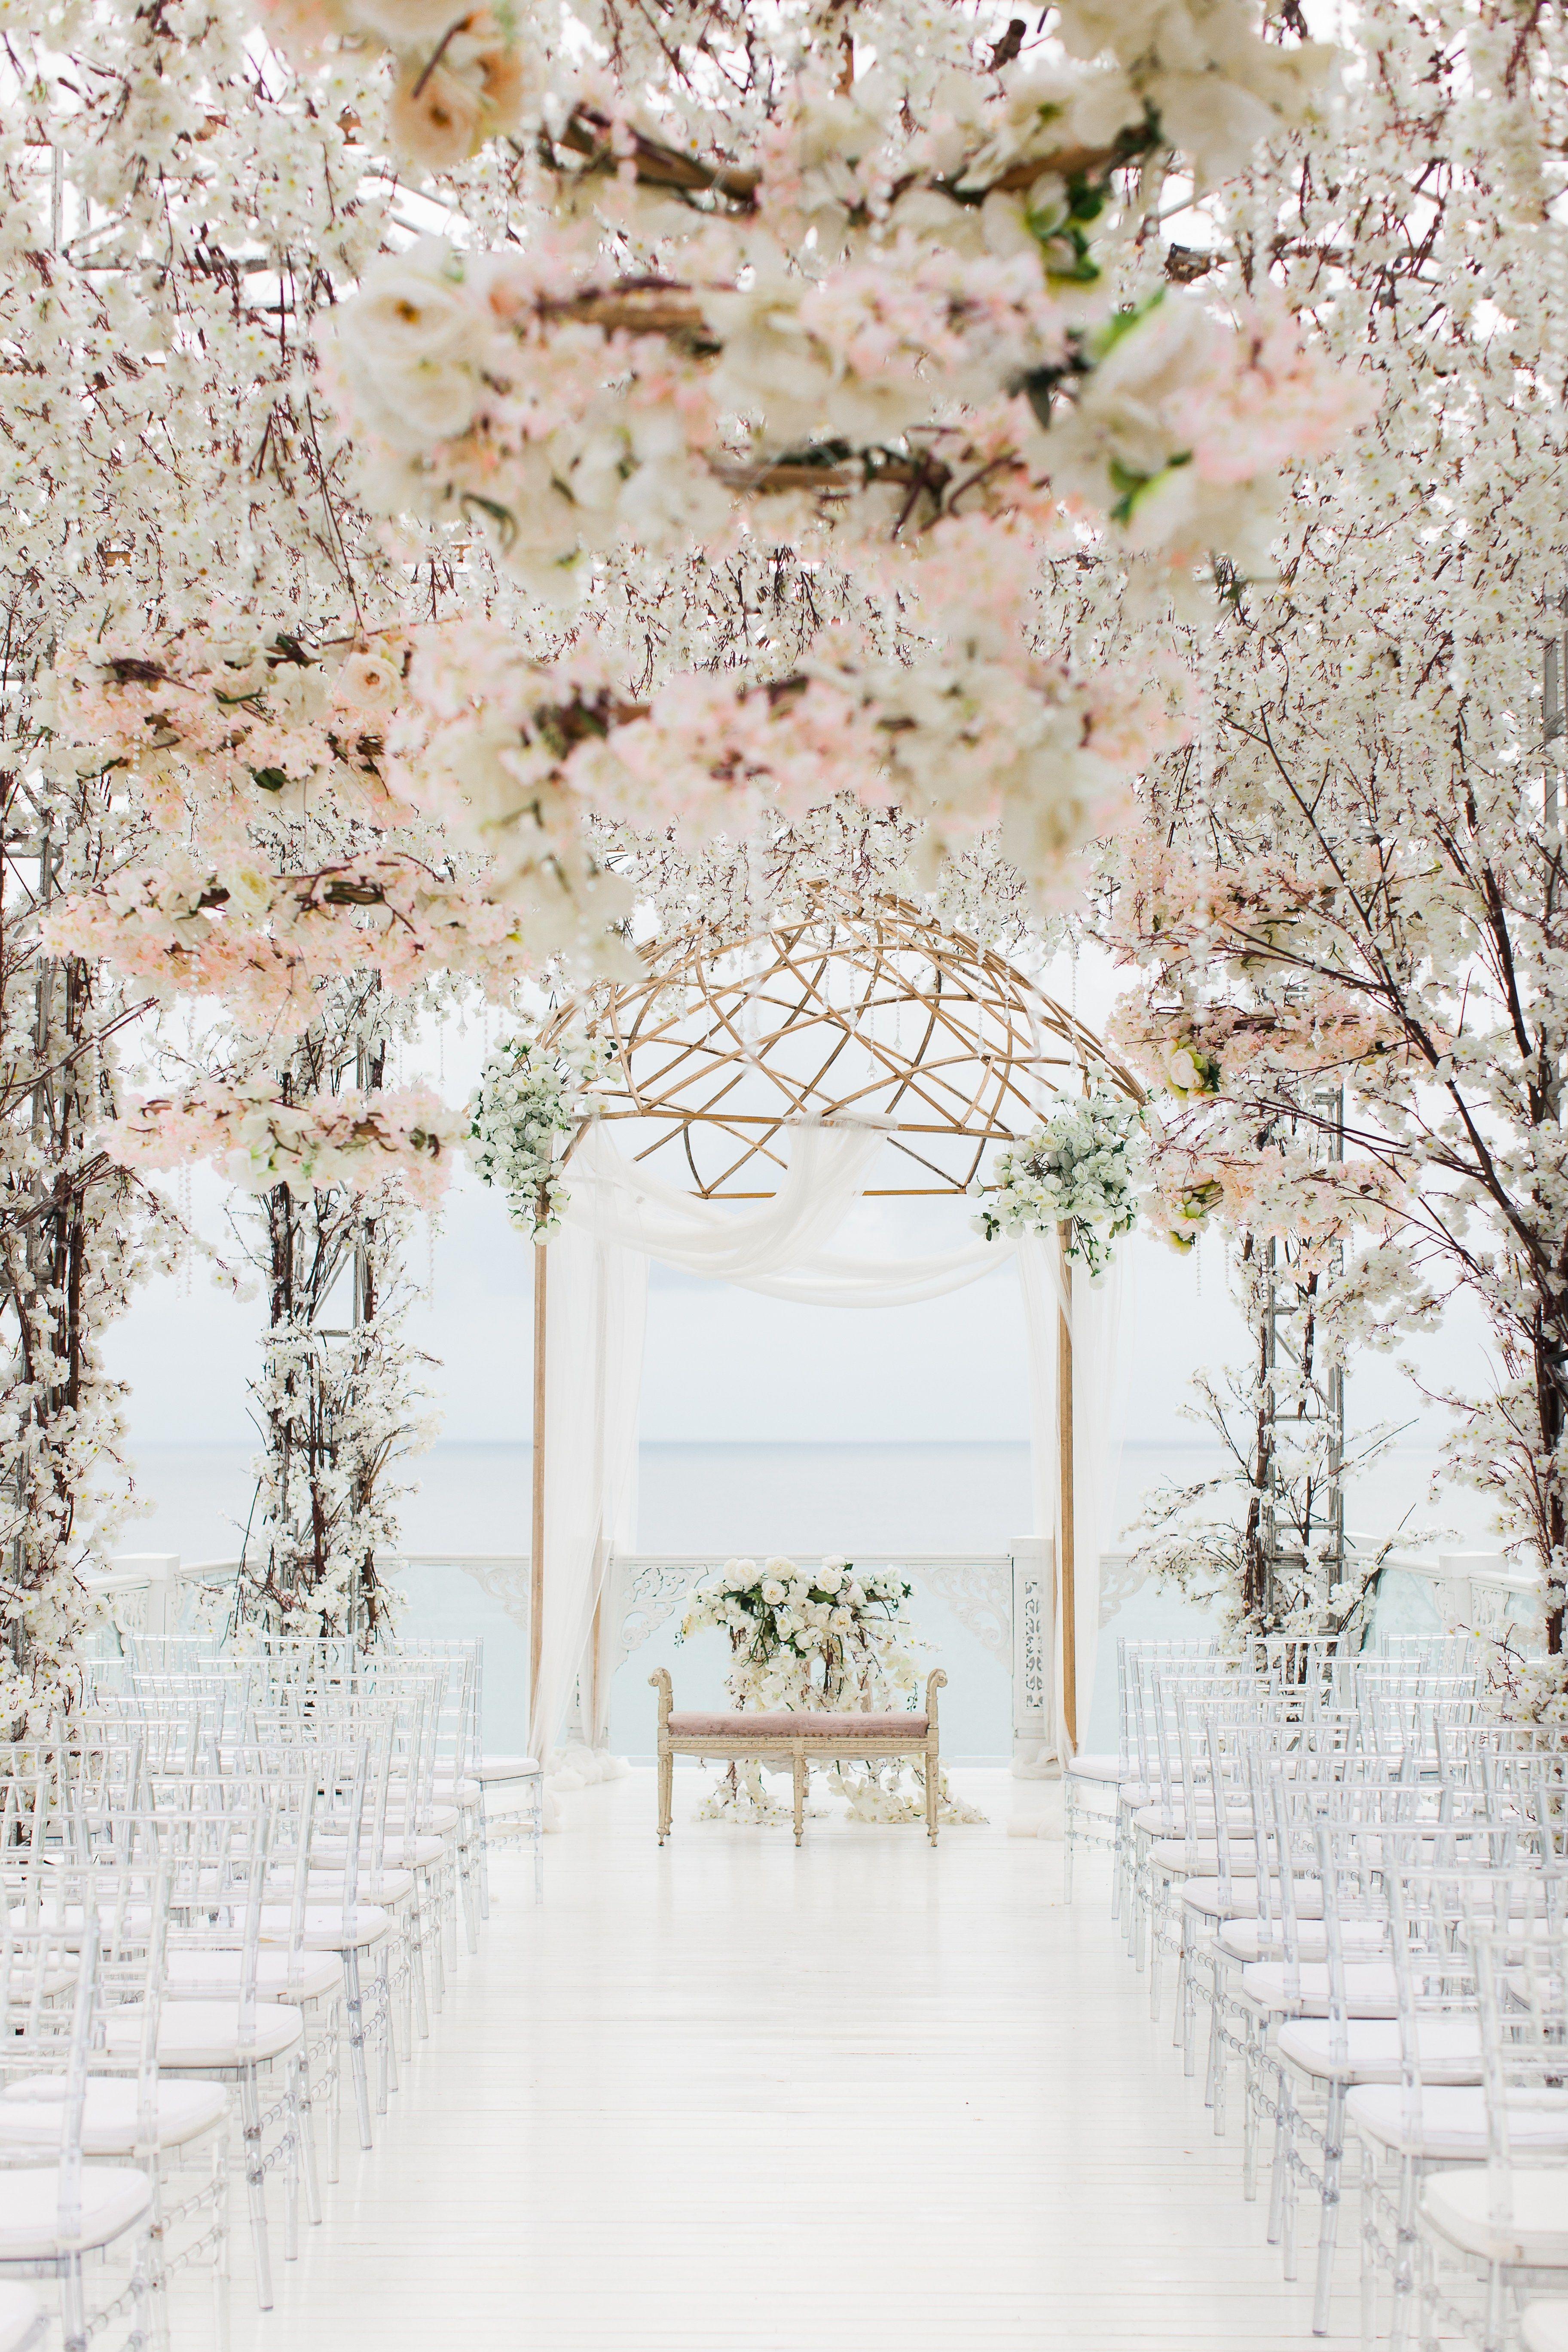 Gorgeous Wedding Ceremony Ideas | Pretty Wedding Aisle Photos ...